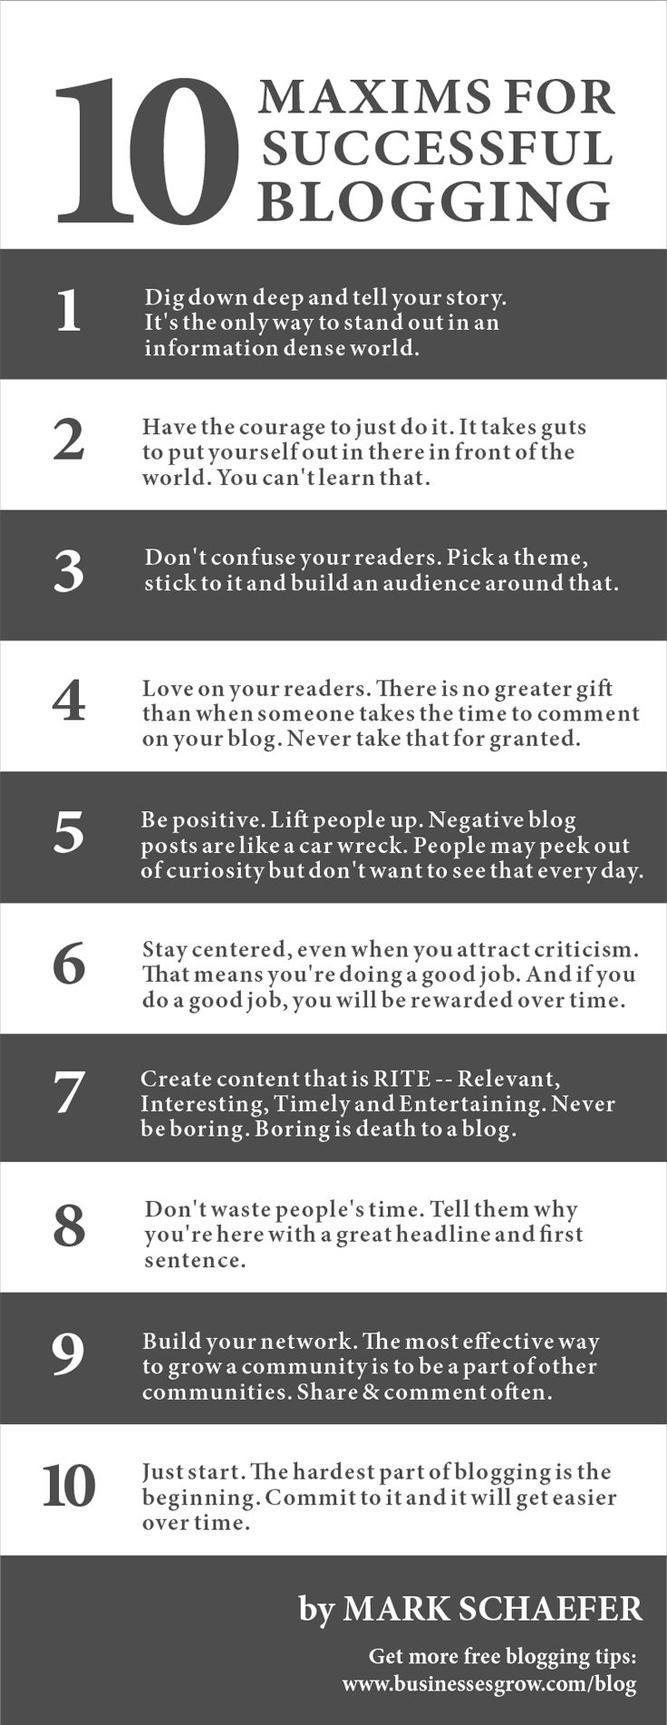 10 Fundamentals for Successful Blogging [Infographic]!